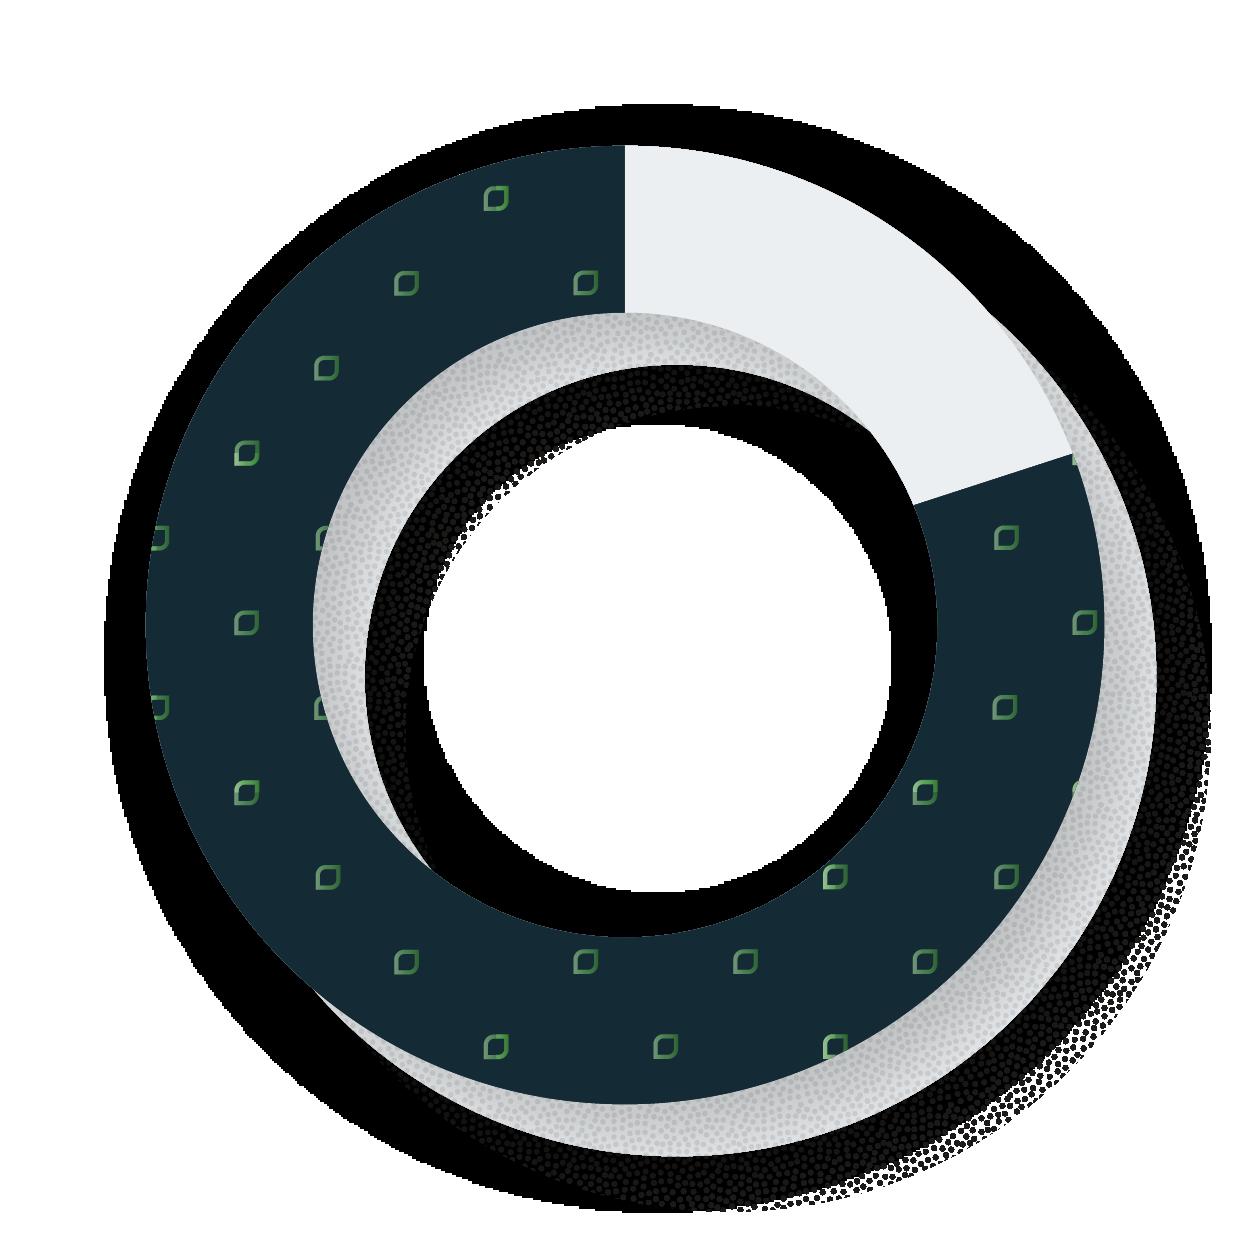 Pie Chart 79%